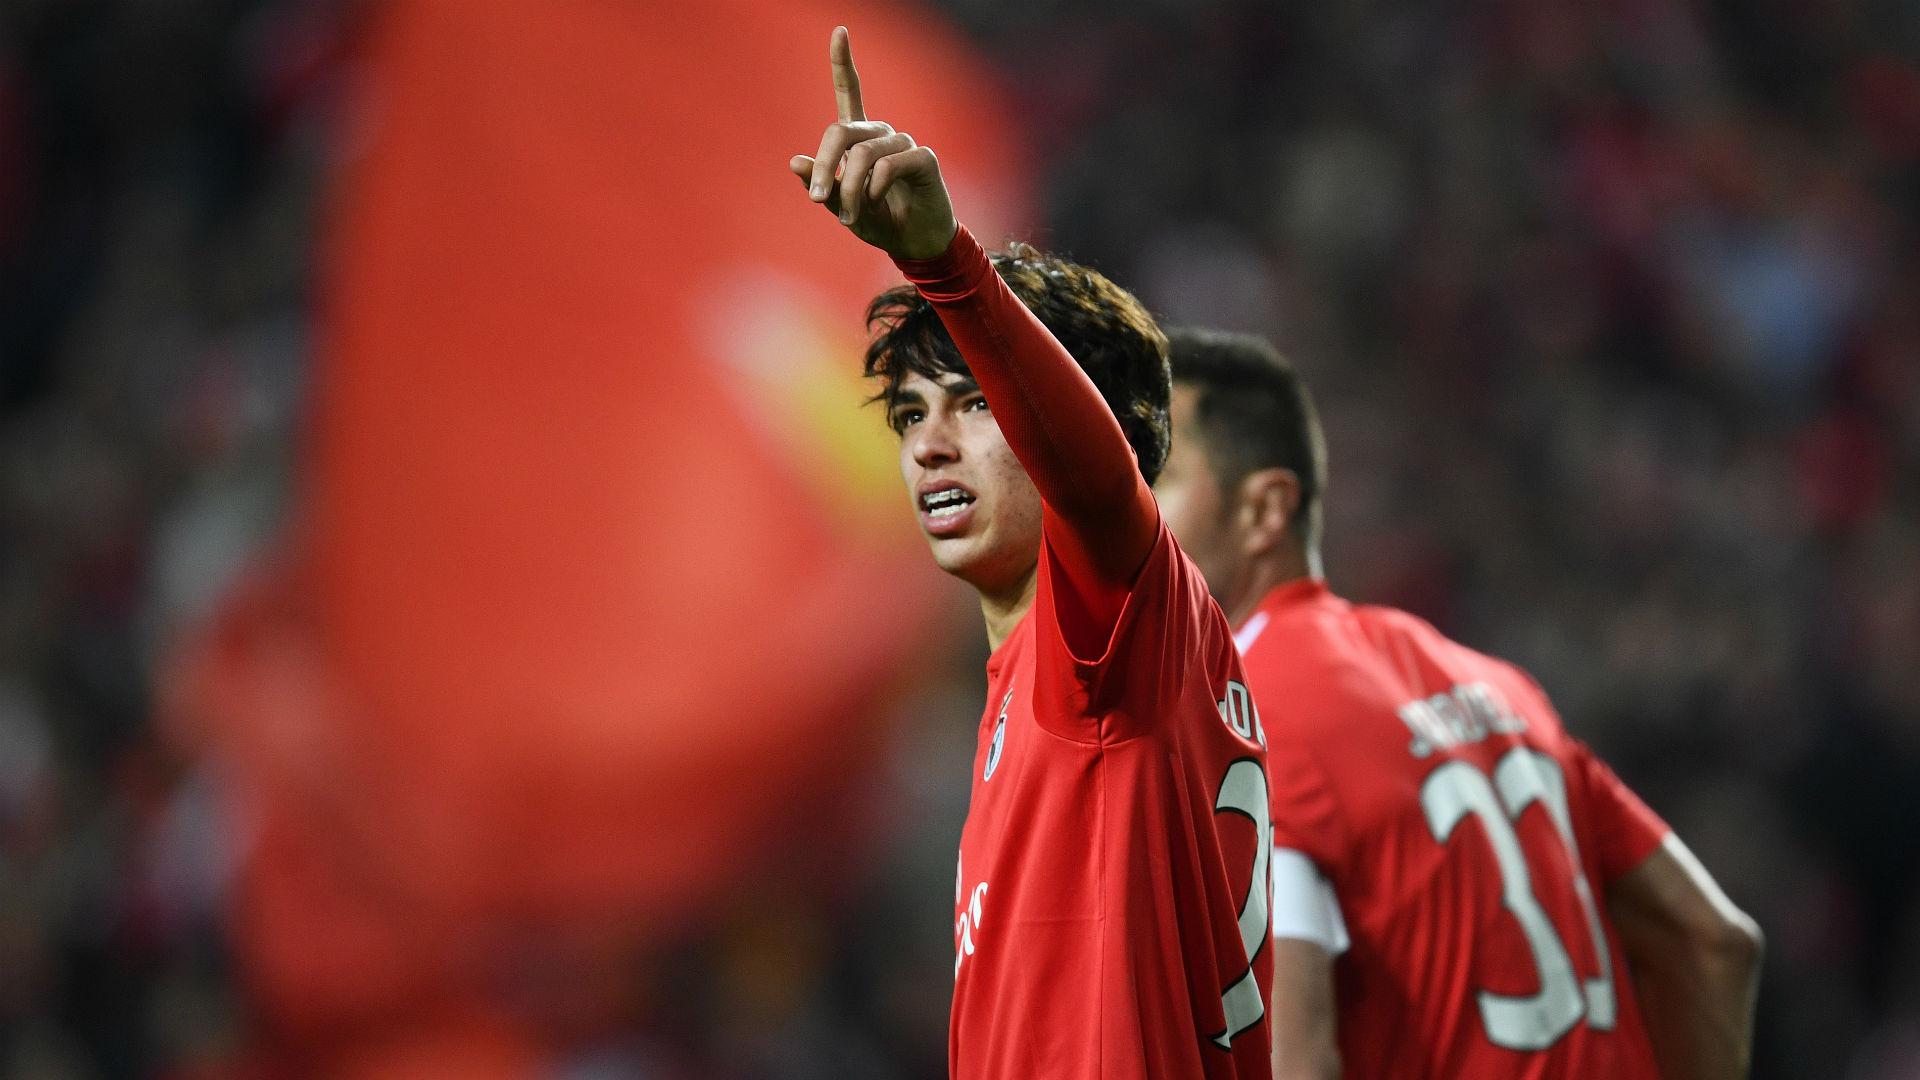 Simeone wants youth like Joao Felix